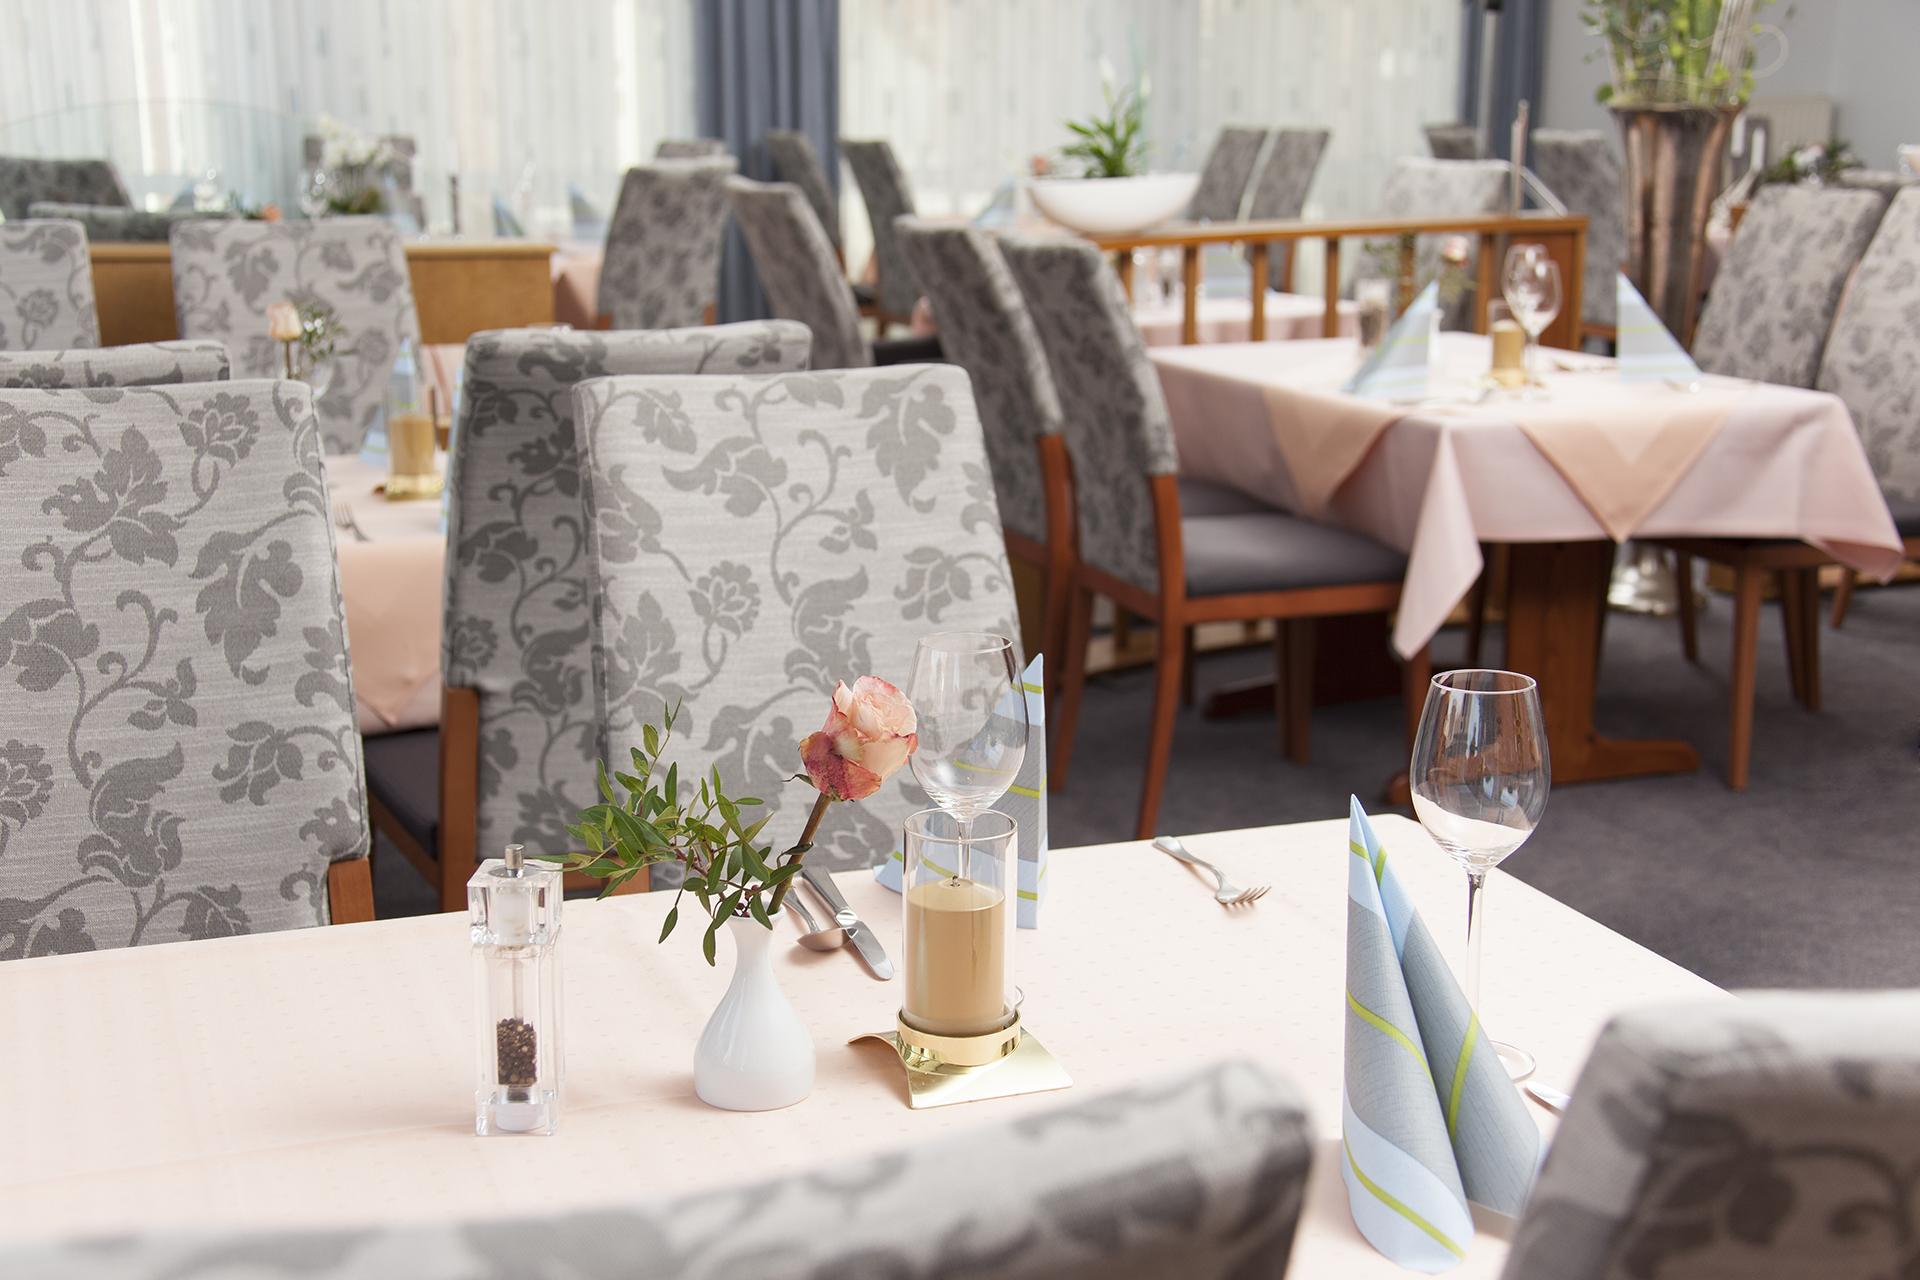 Berufsfotografin-Liesa-Flemming-Hotel-Kämper-12